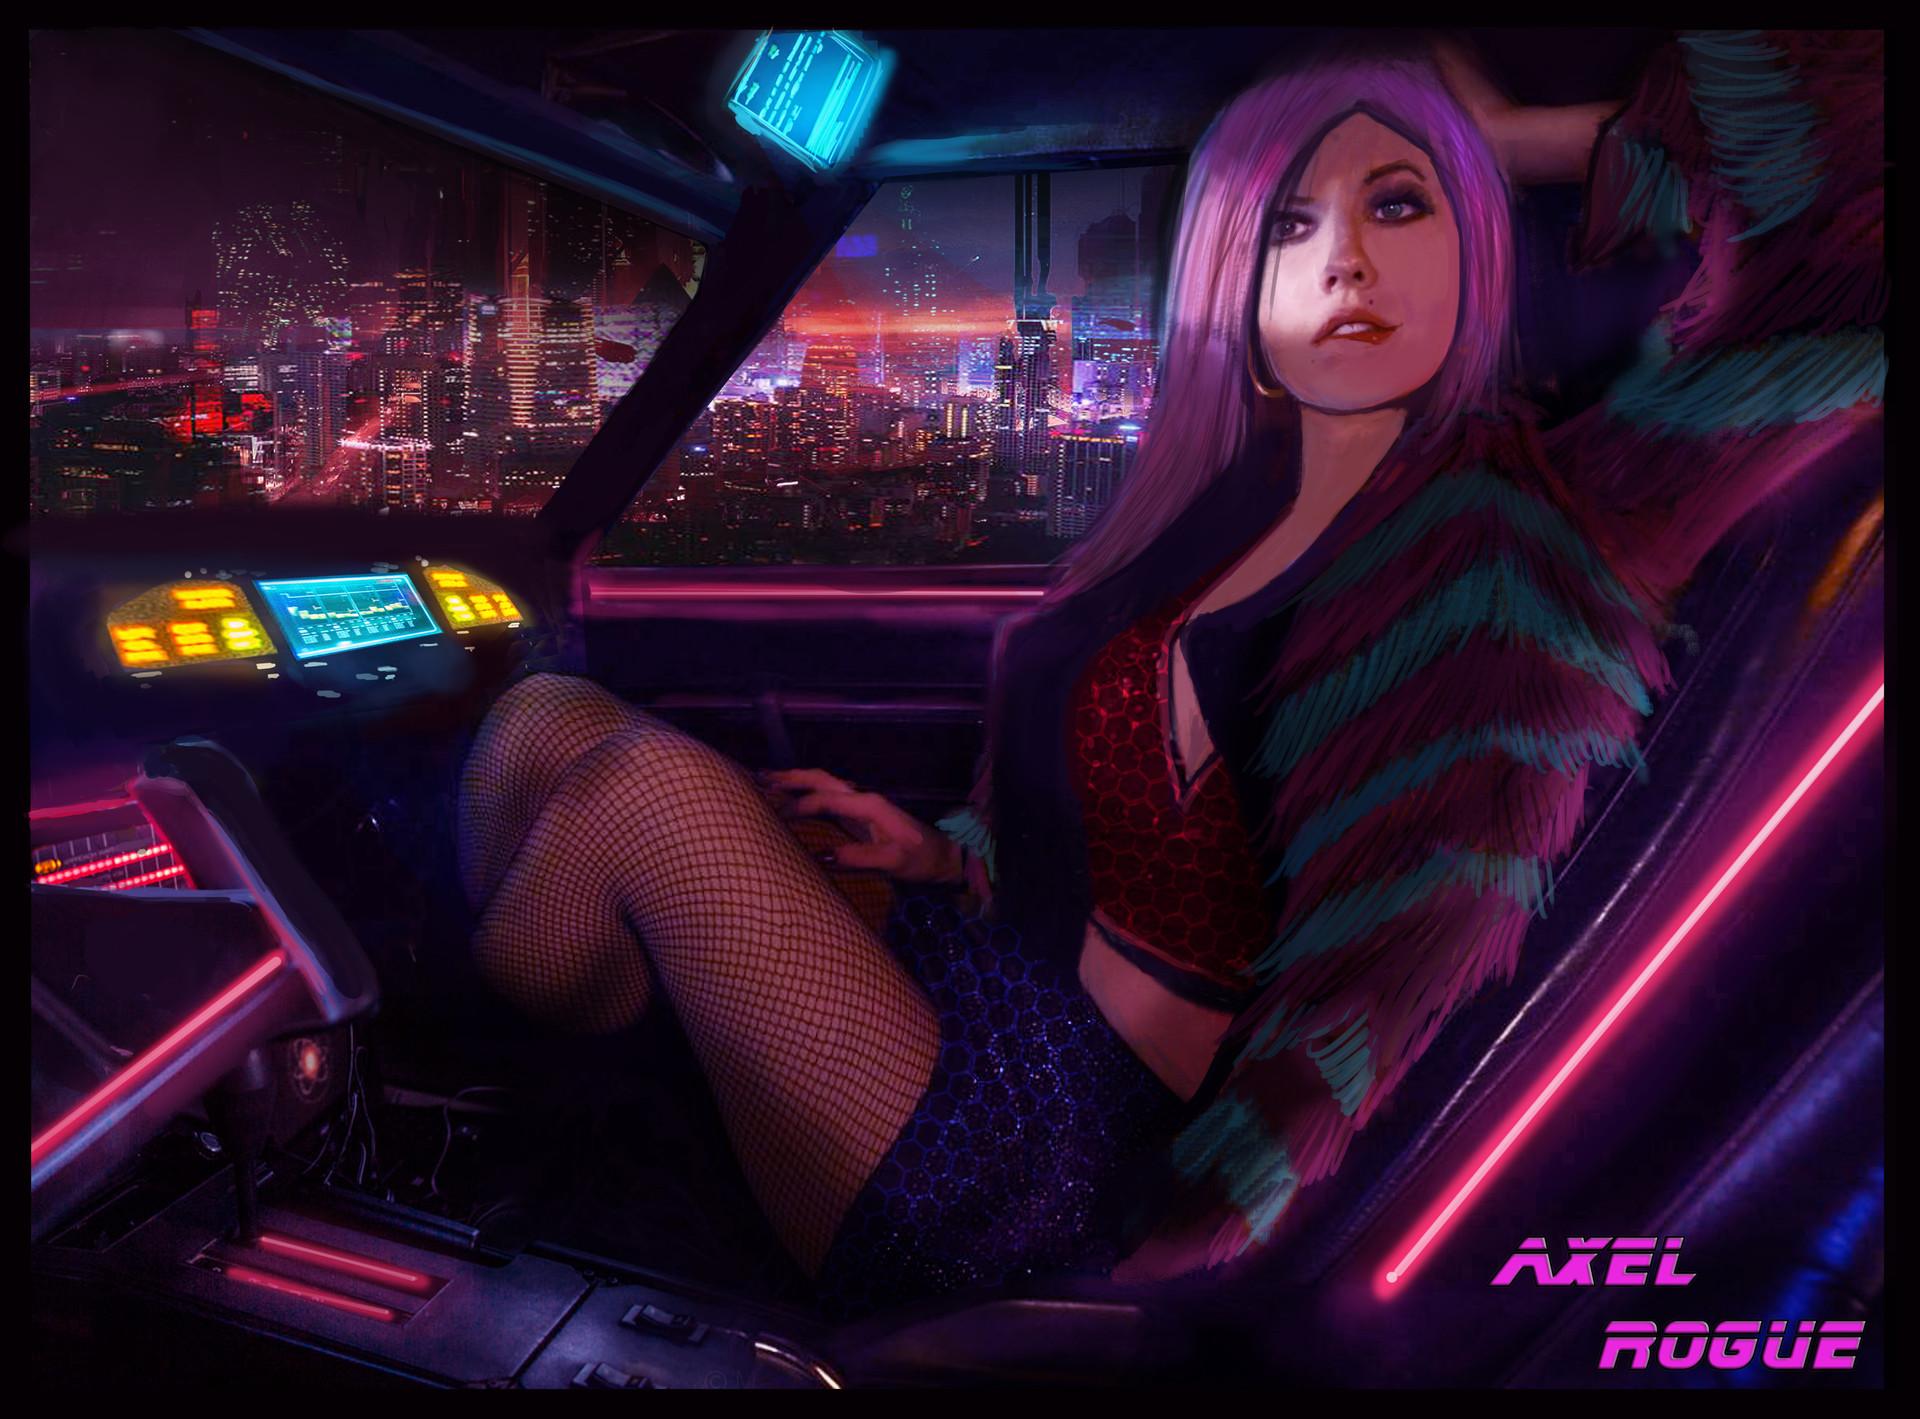 rogue-girl - Cyberpunk 2077